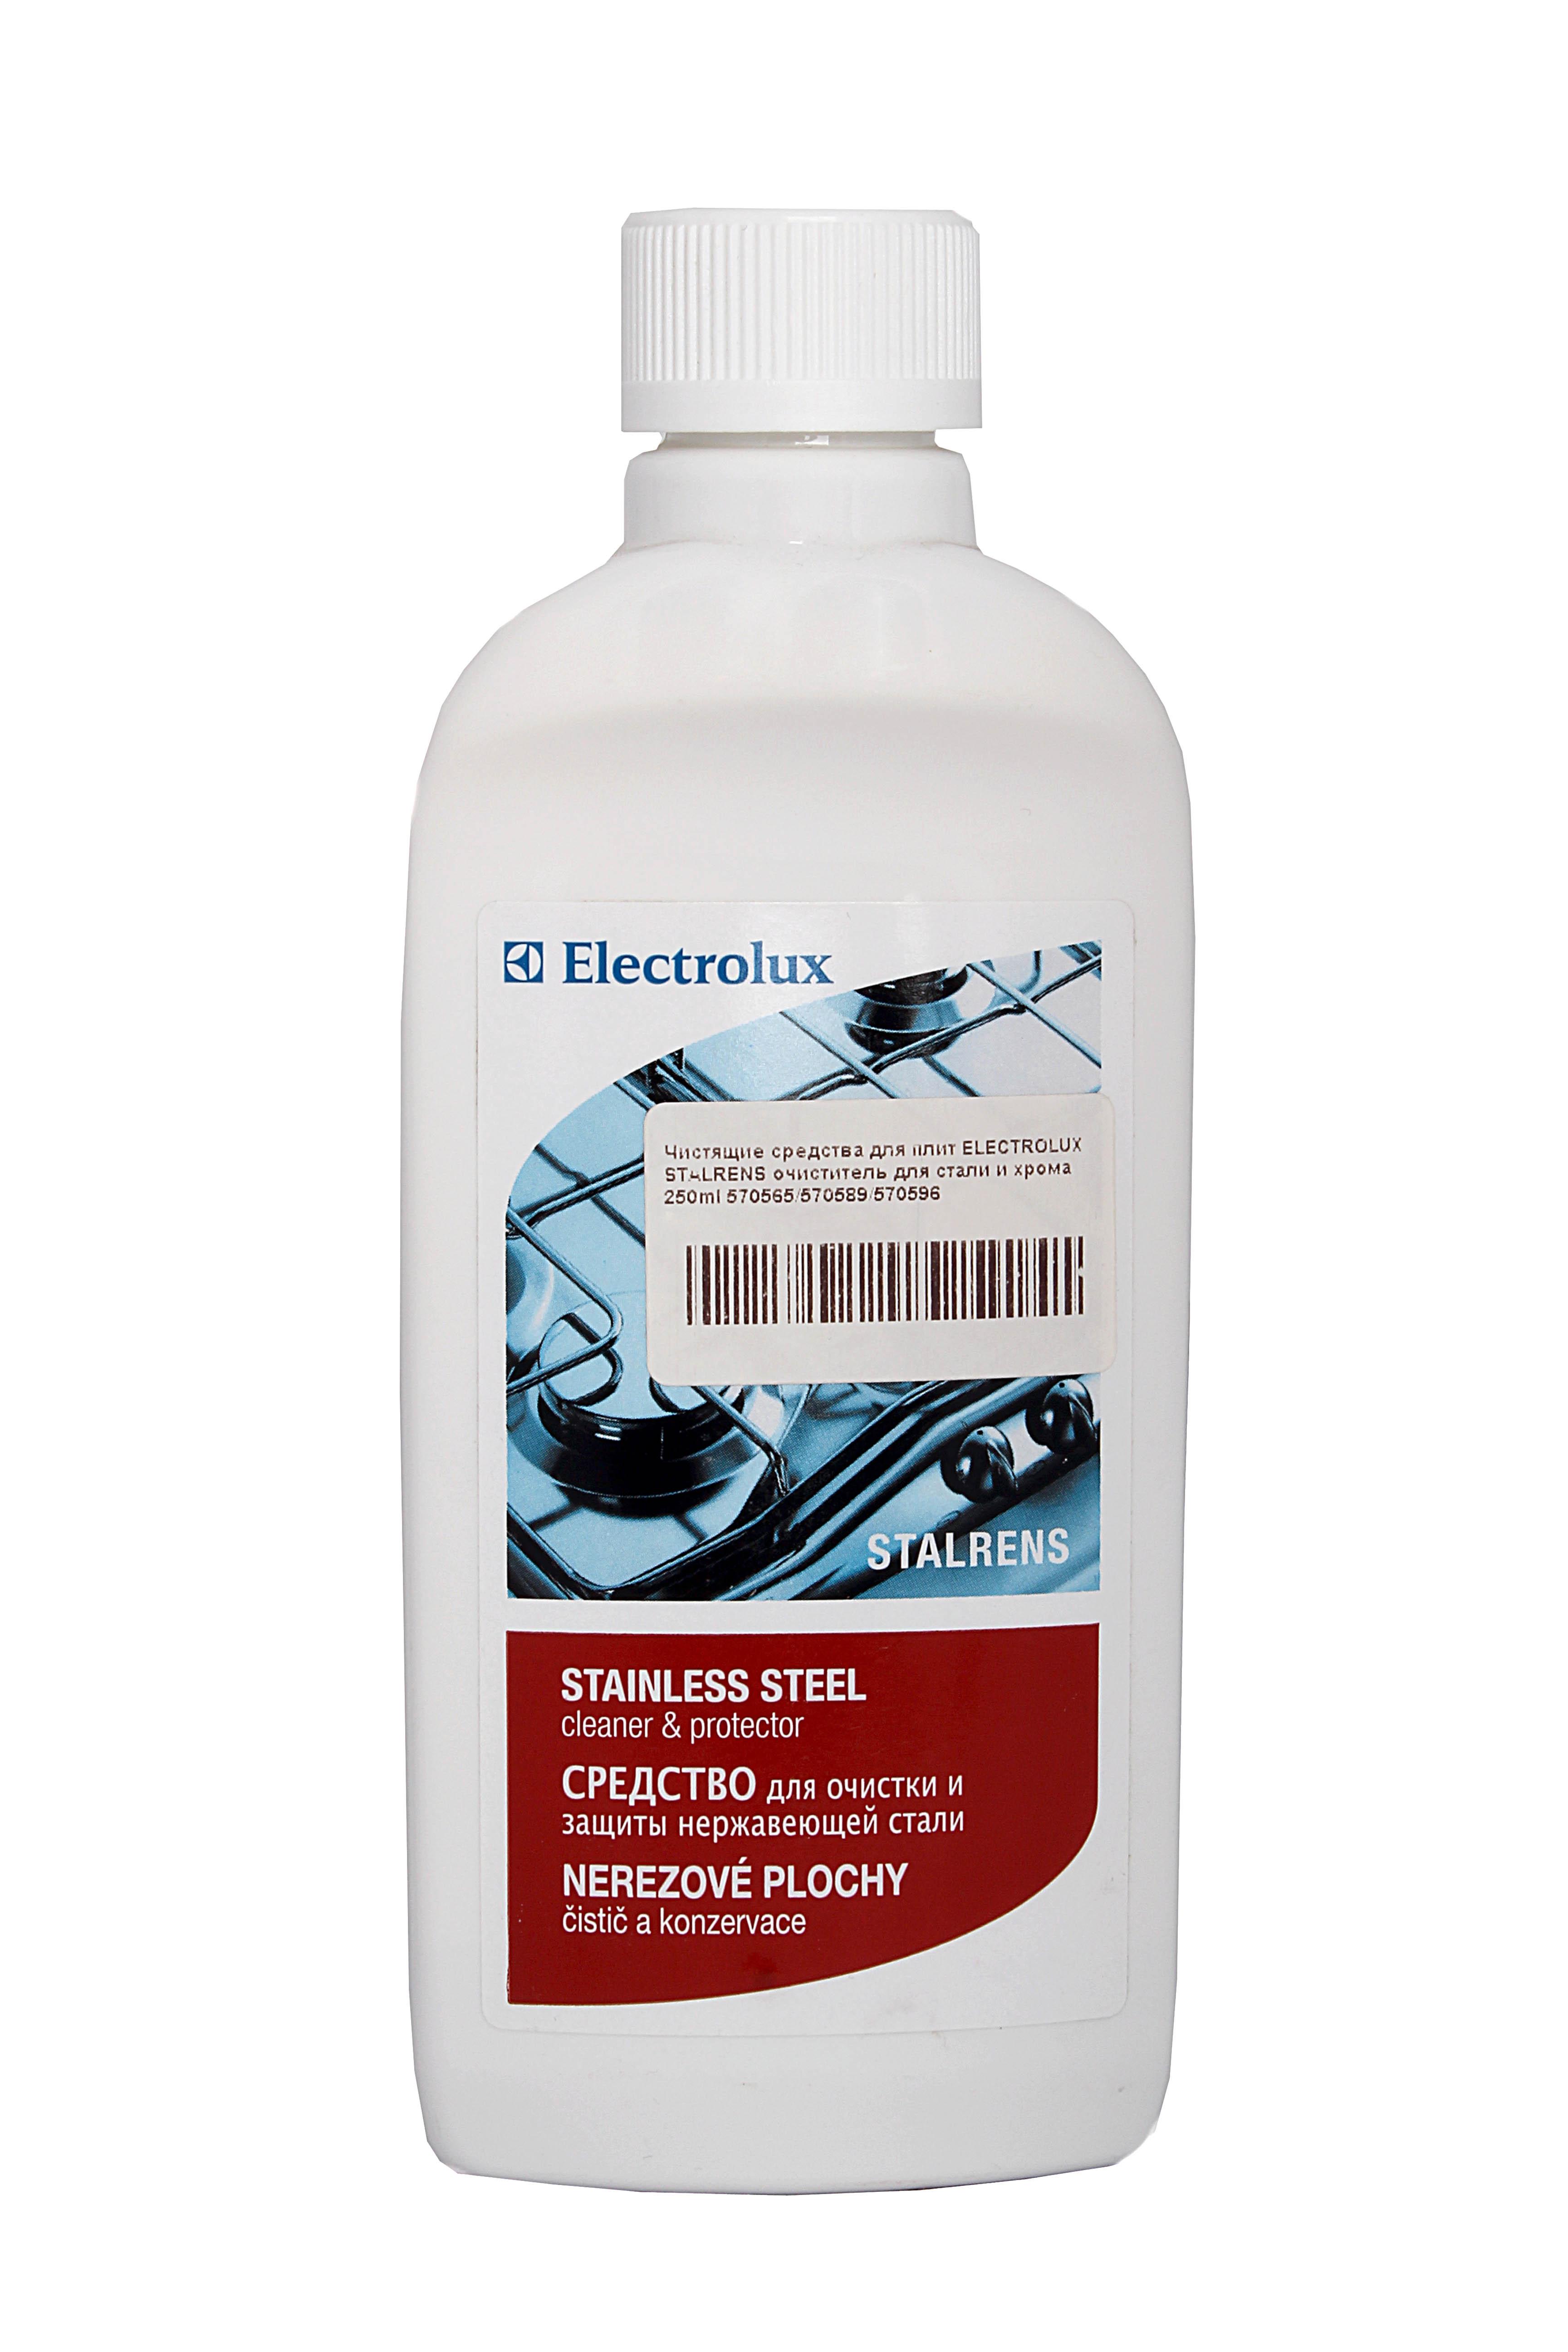 Чистящее средство для метал.поверхности electrolux stalrens steel cleaner 2 250мл фото